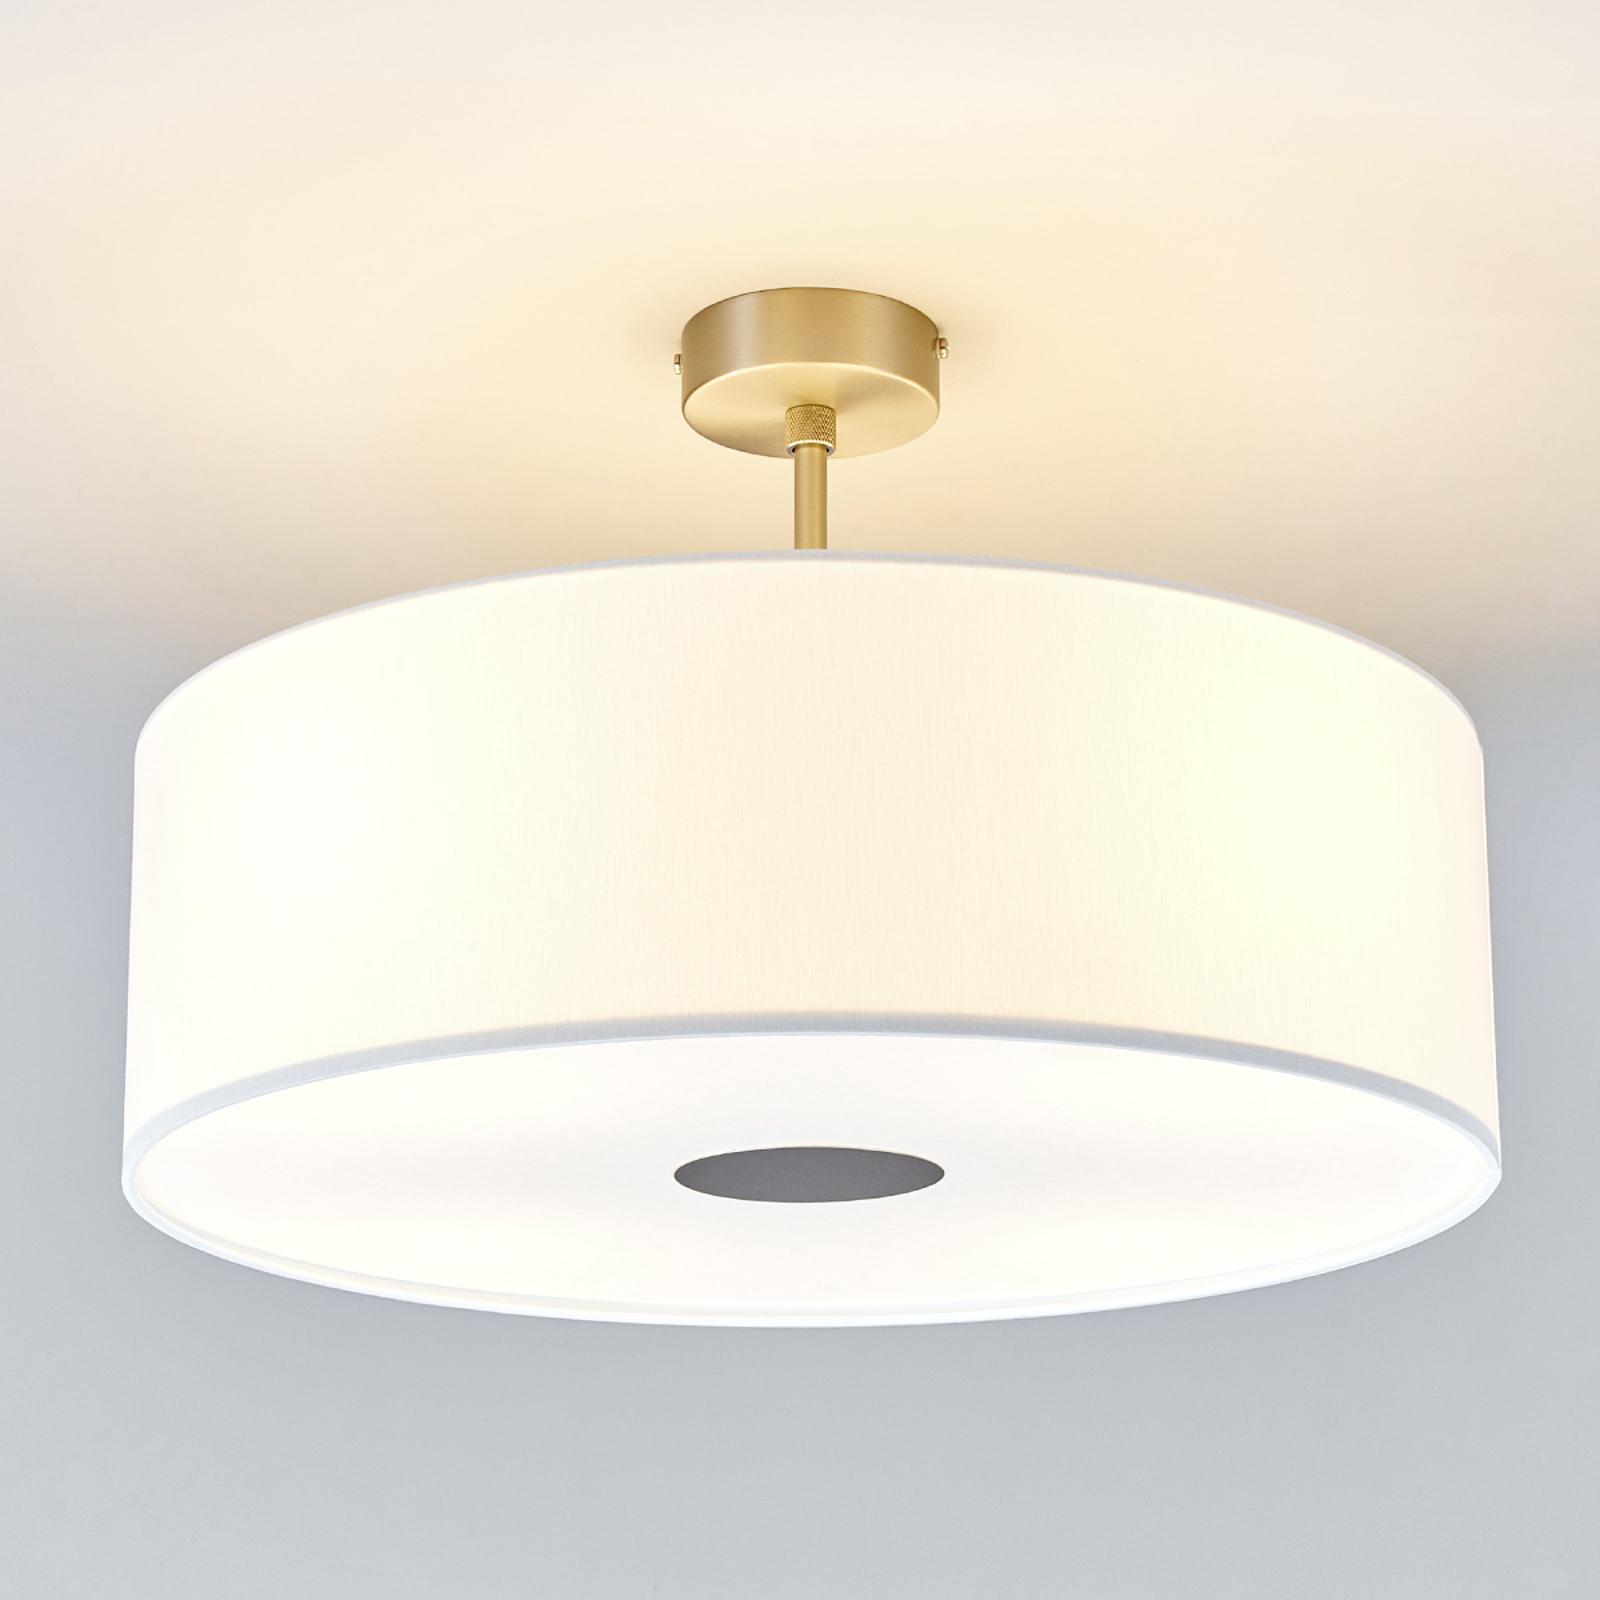 Plafondlamp met afstand Gala, 50cm, sits wit